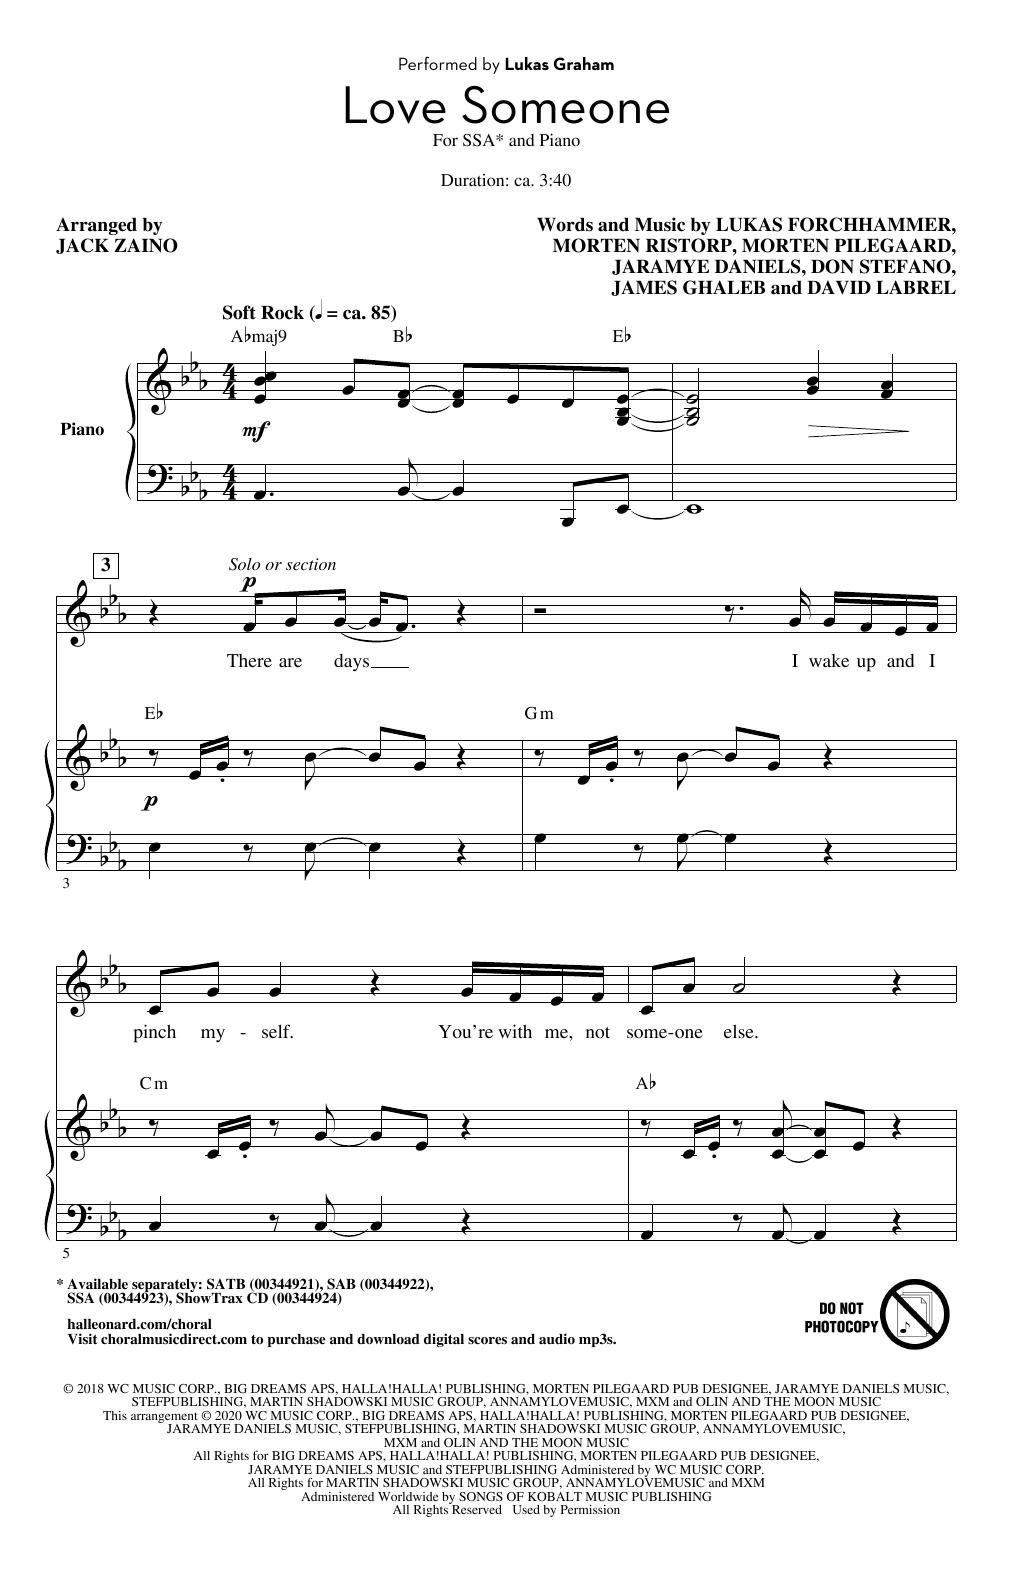 Love Someone (arr. Jack Zaino) (SSA Choir)